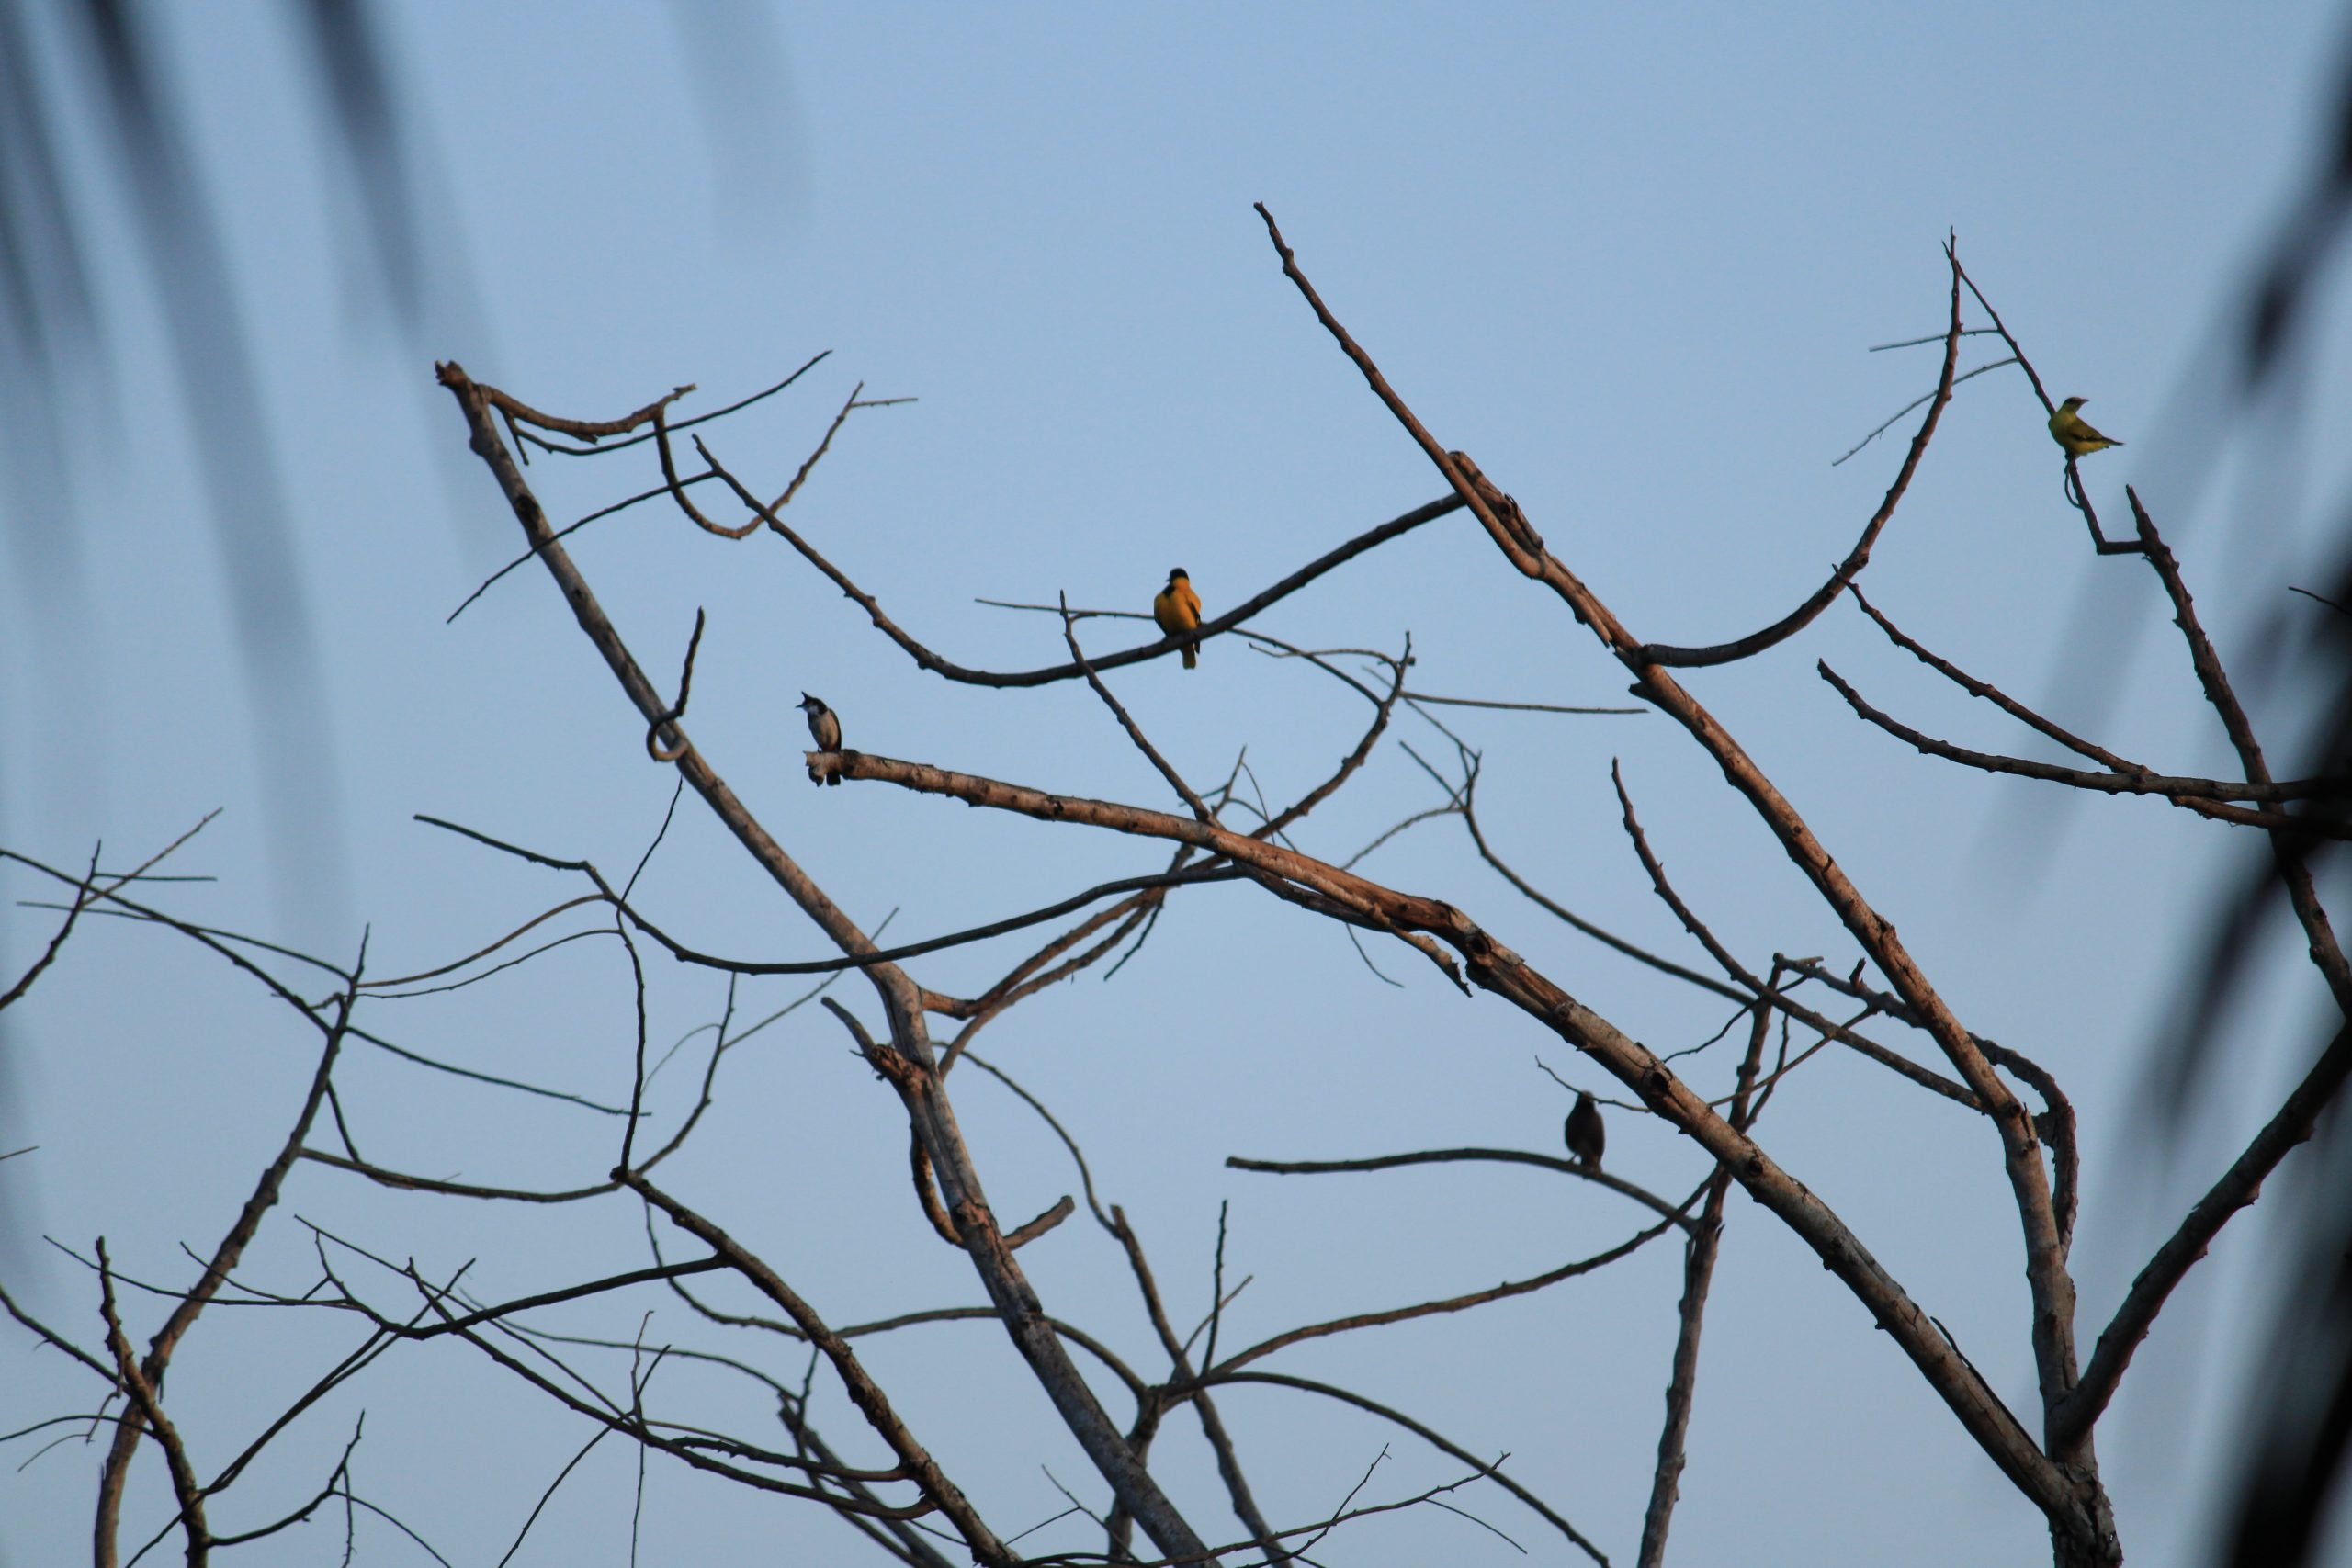 Birds sitting on the tree.